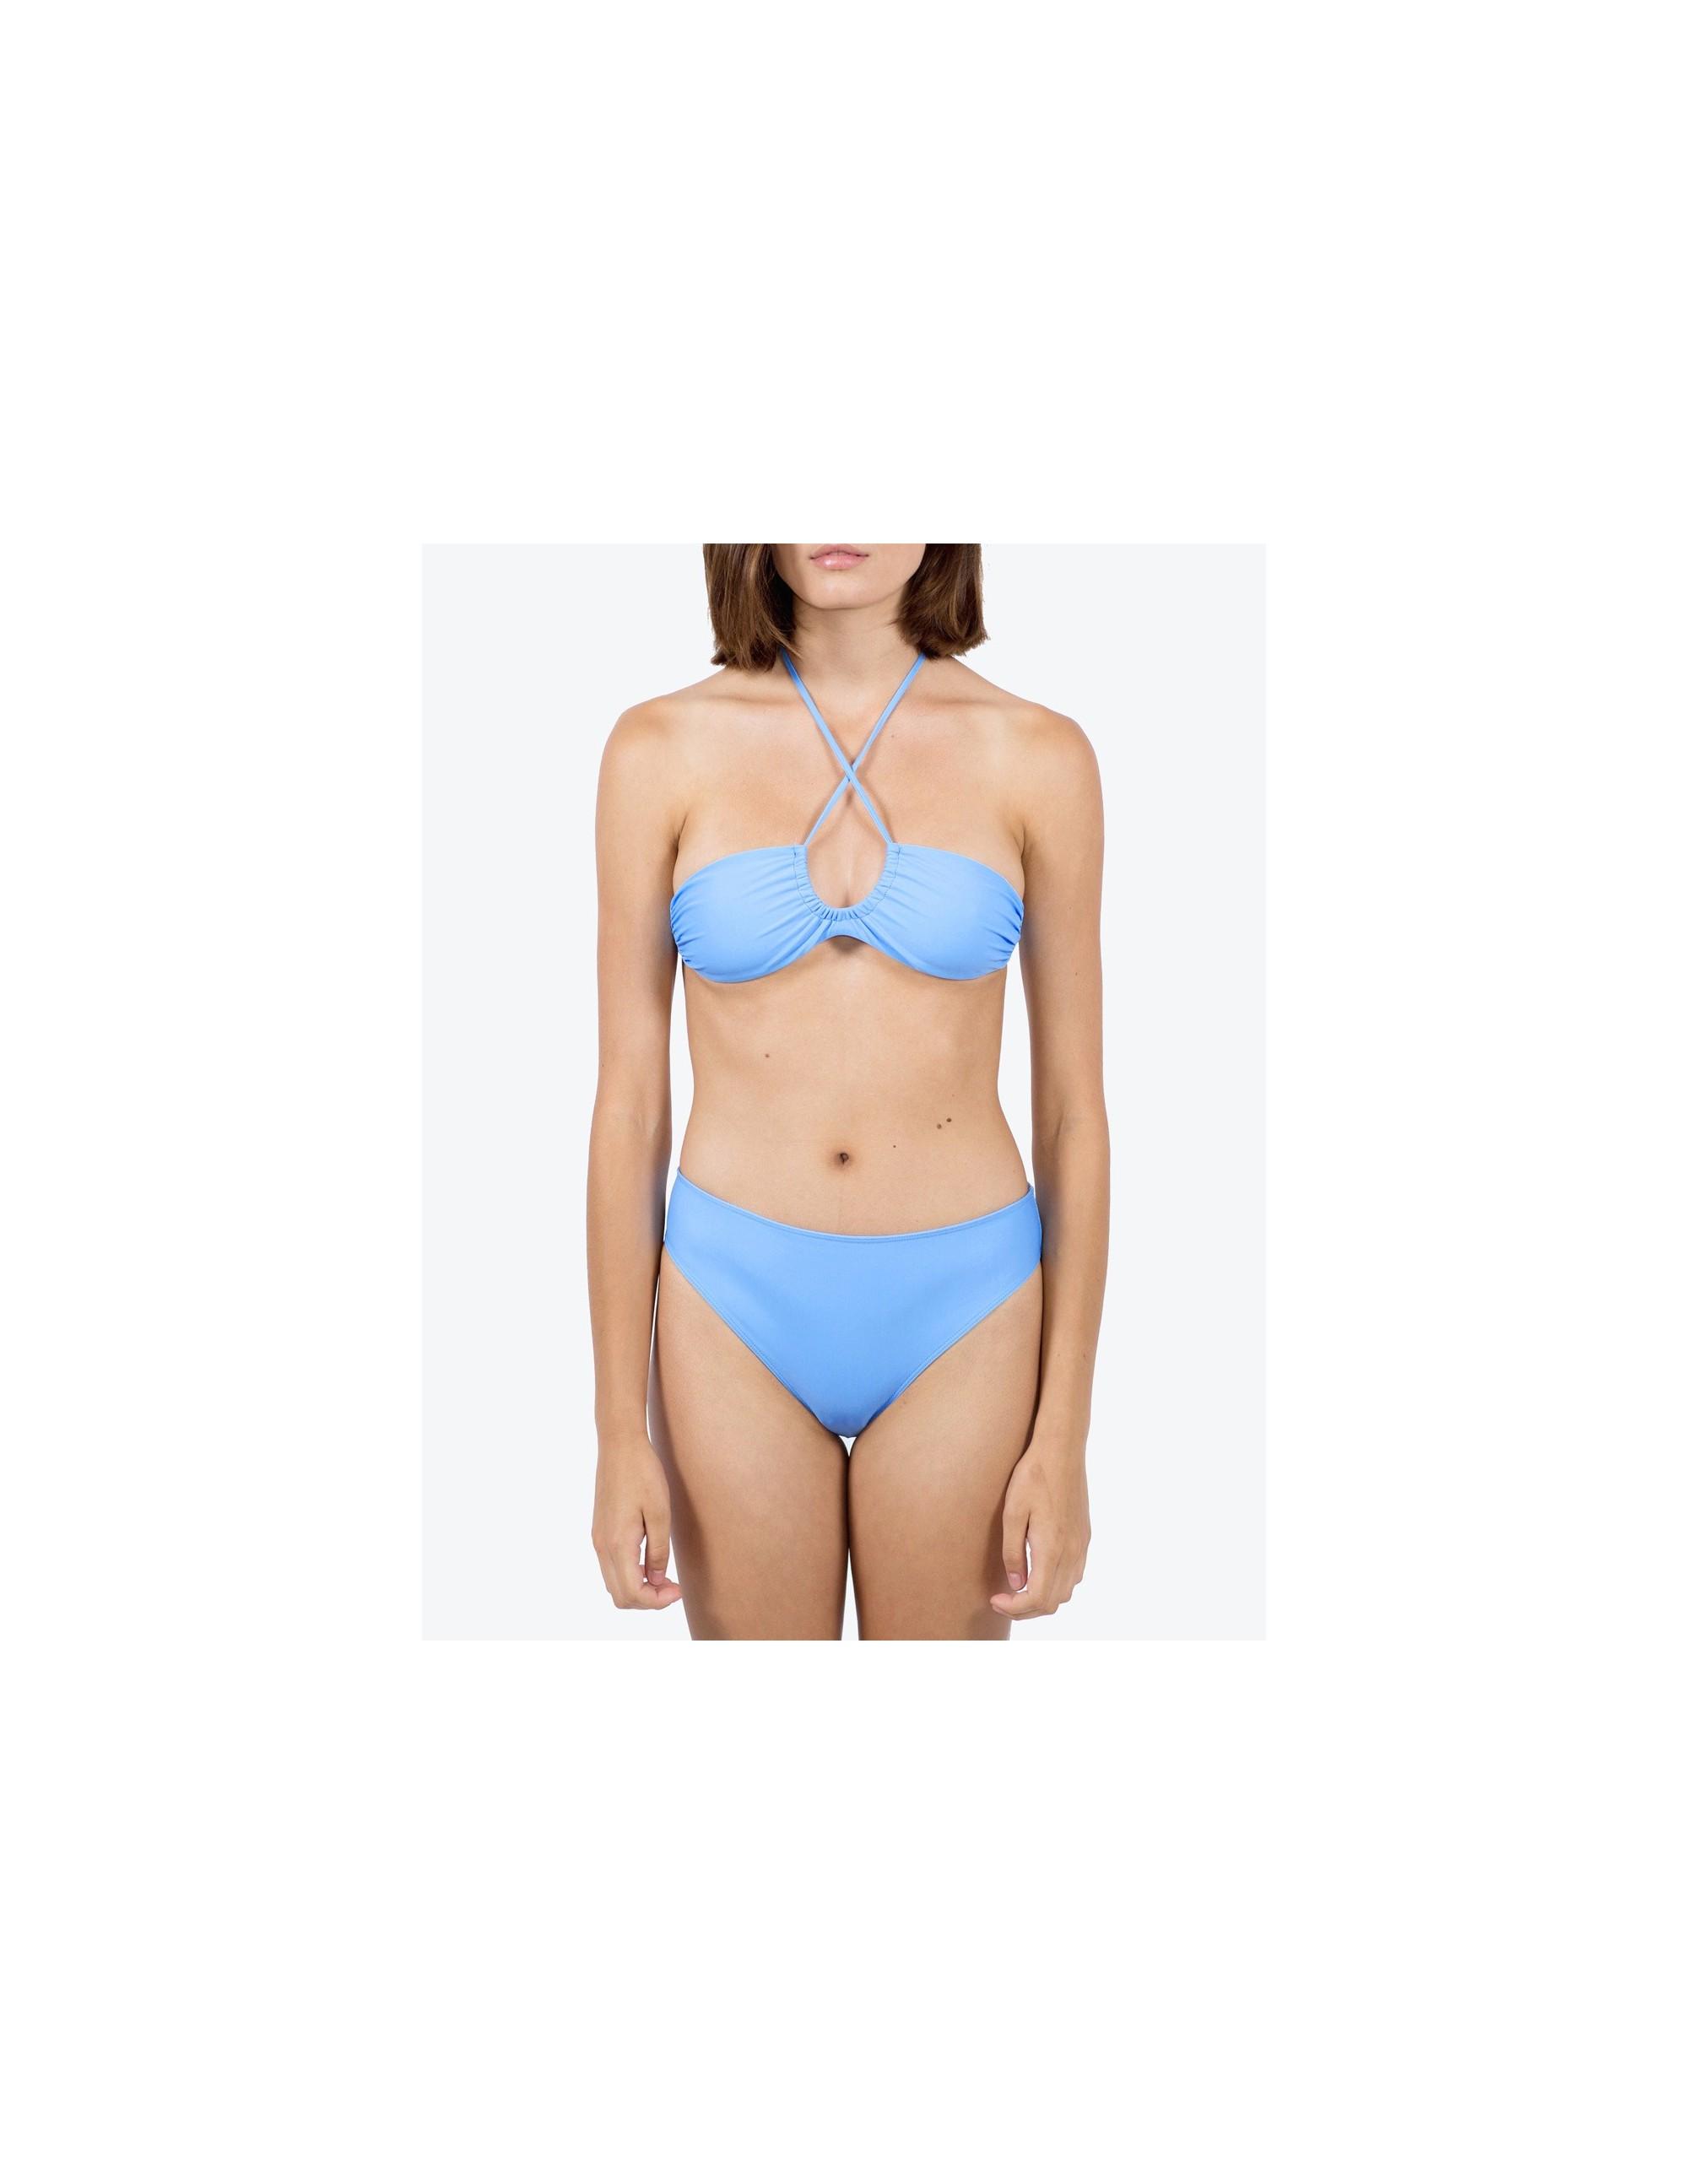 VAI bikini bottom - SKY BLUE